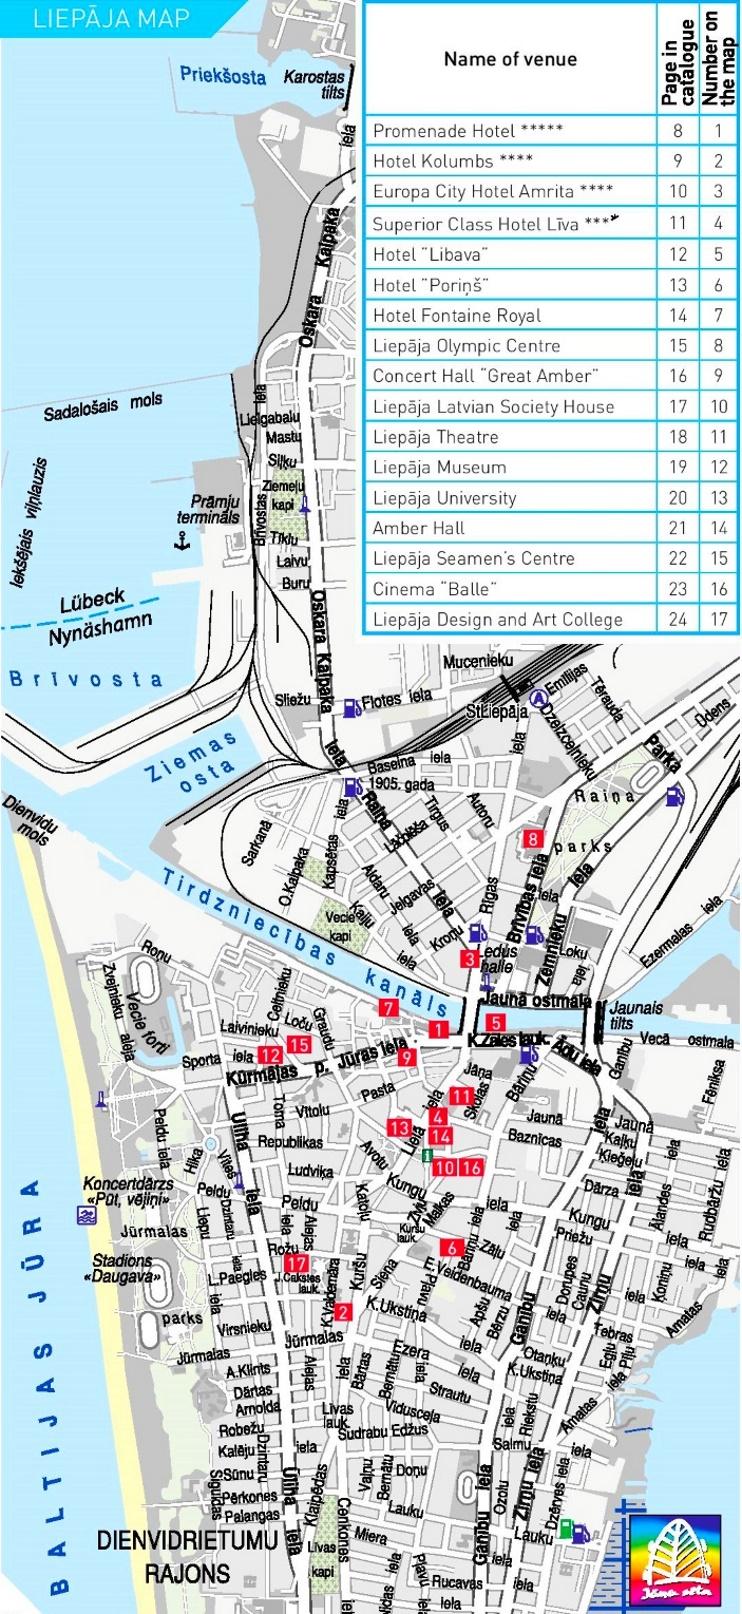 Liepāja tourist map